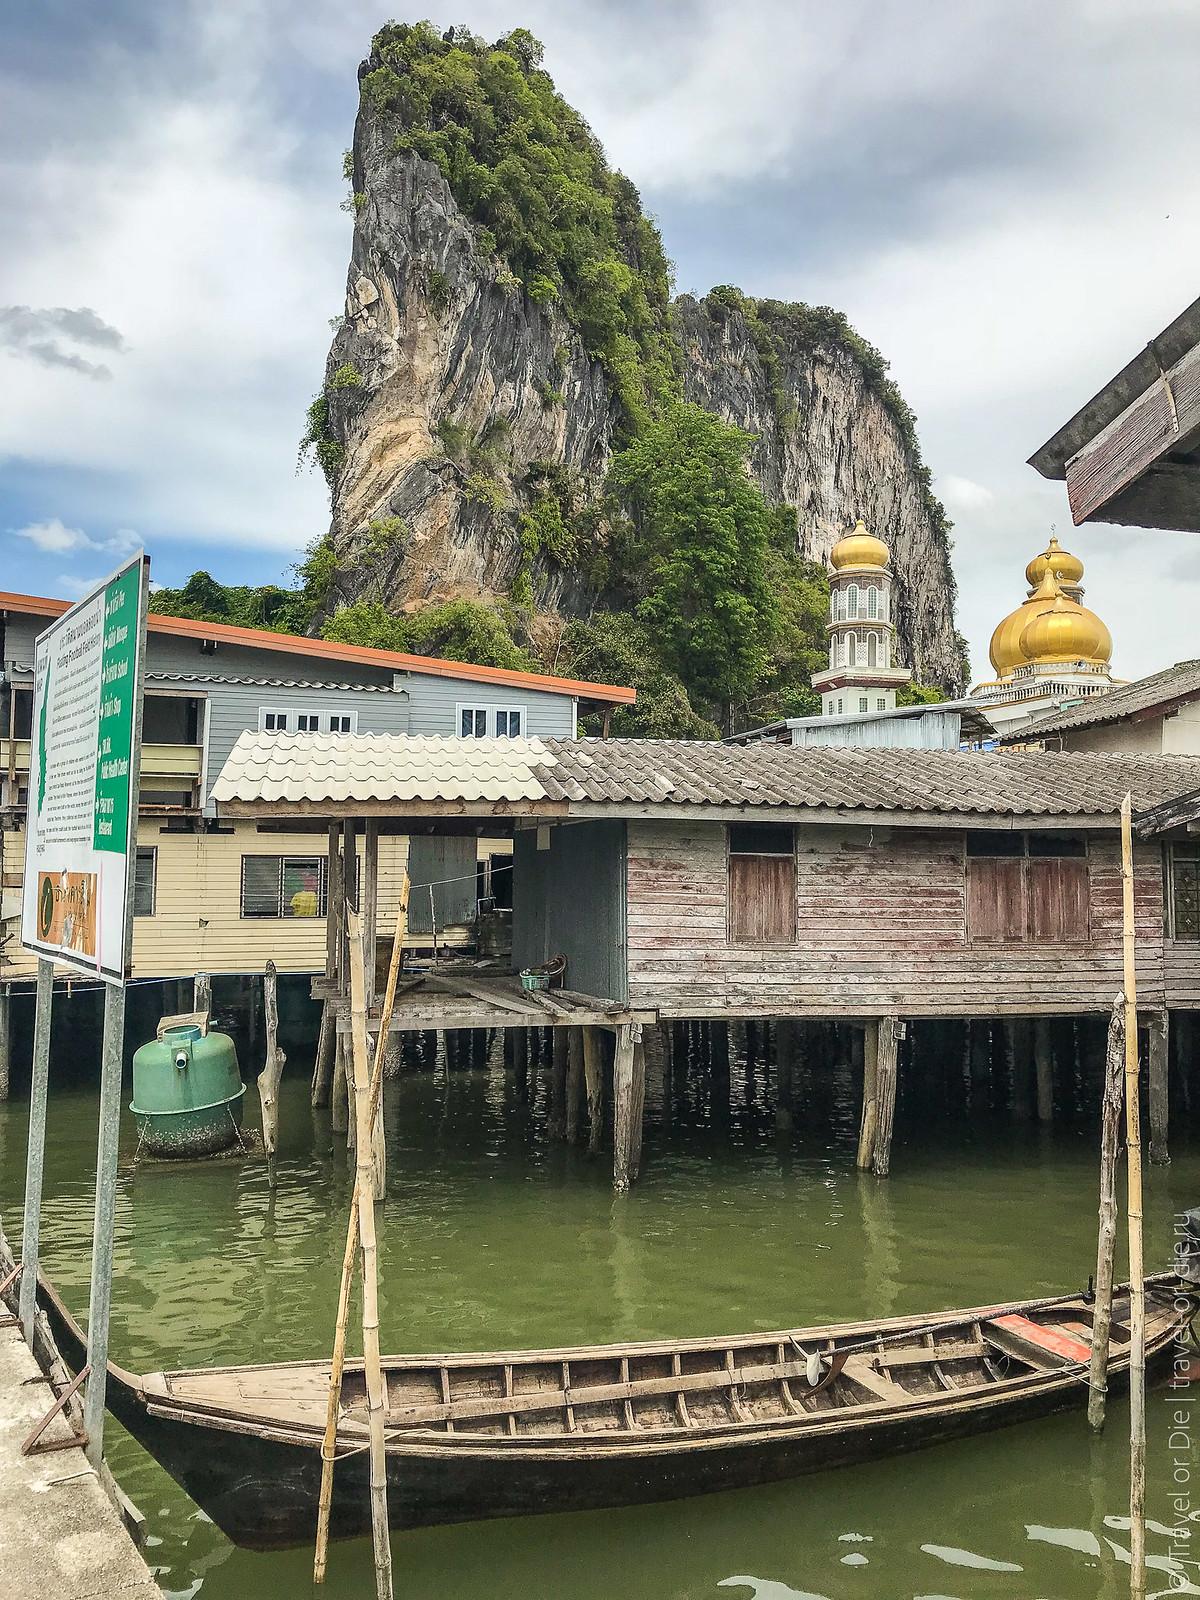 Koh-Panyi-Sea-Gypsy-Floating-Village-Thailand-8461